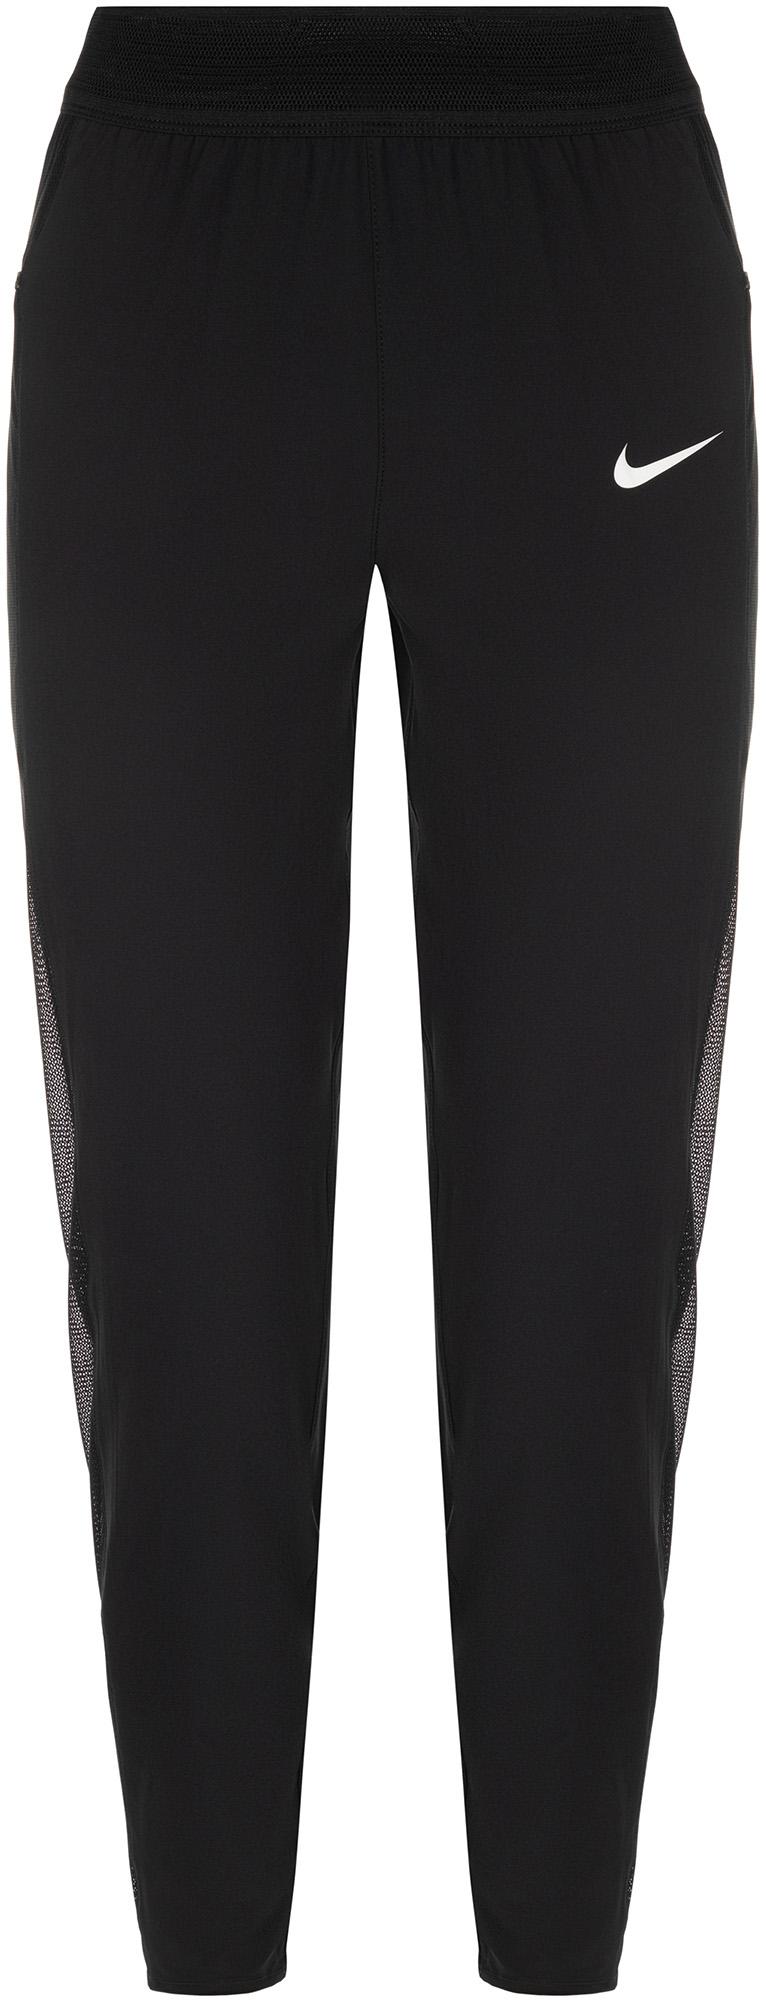 Nike Легинсы женские Nike Essential RunWay, размер 42-44 цена 2017